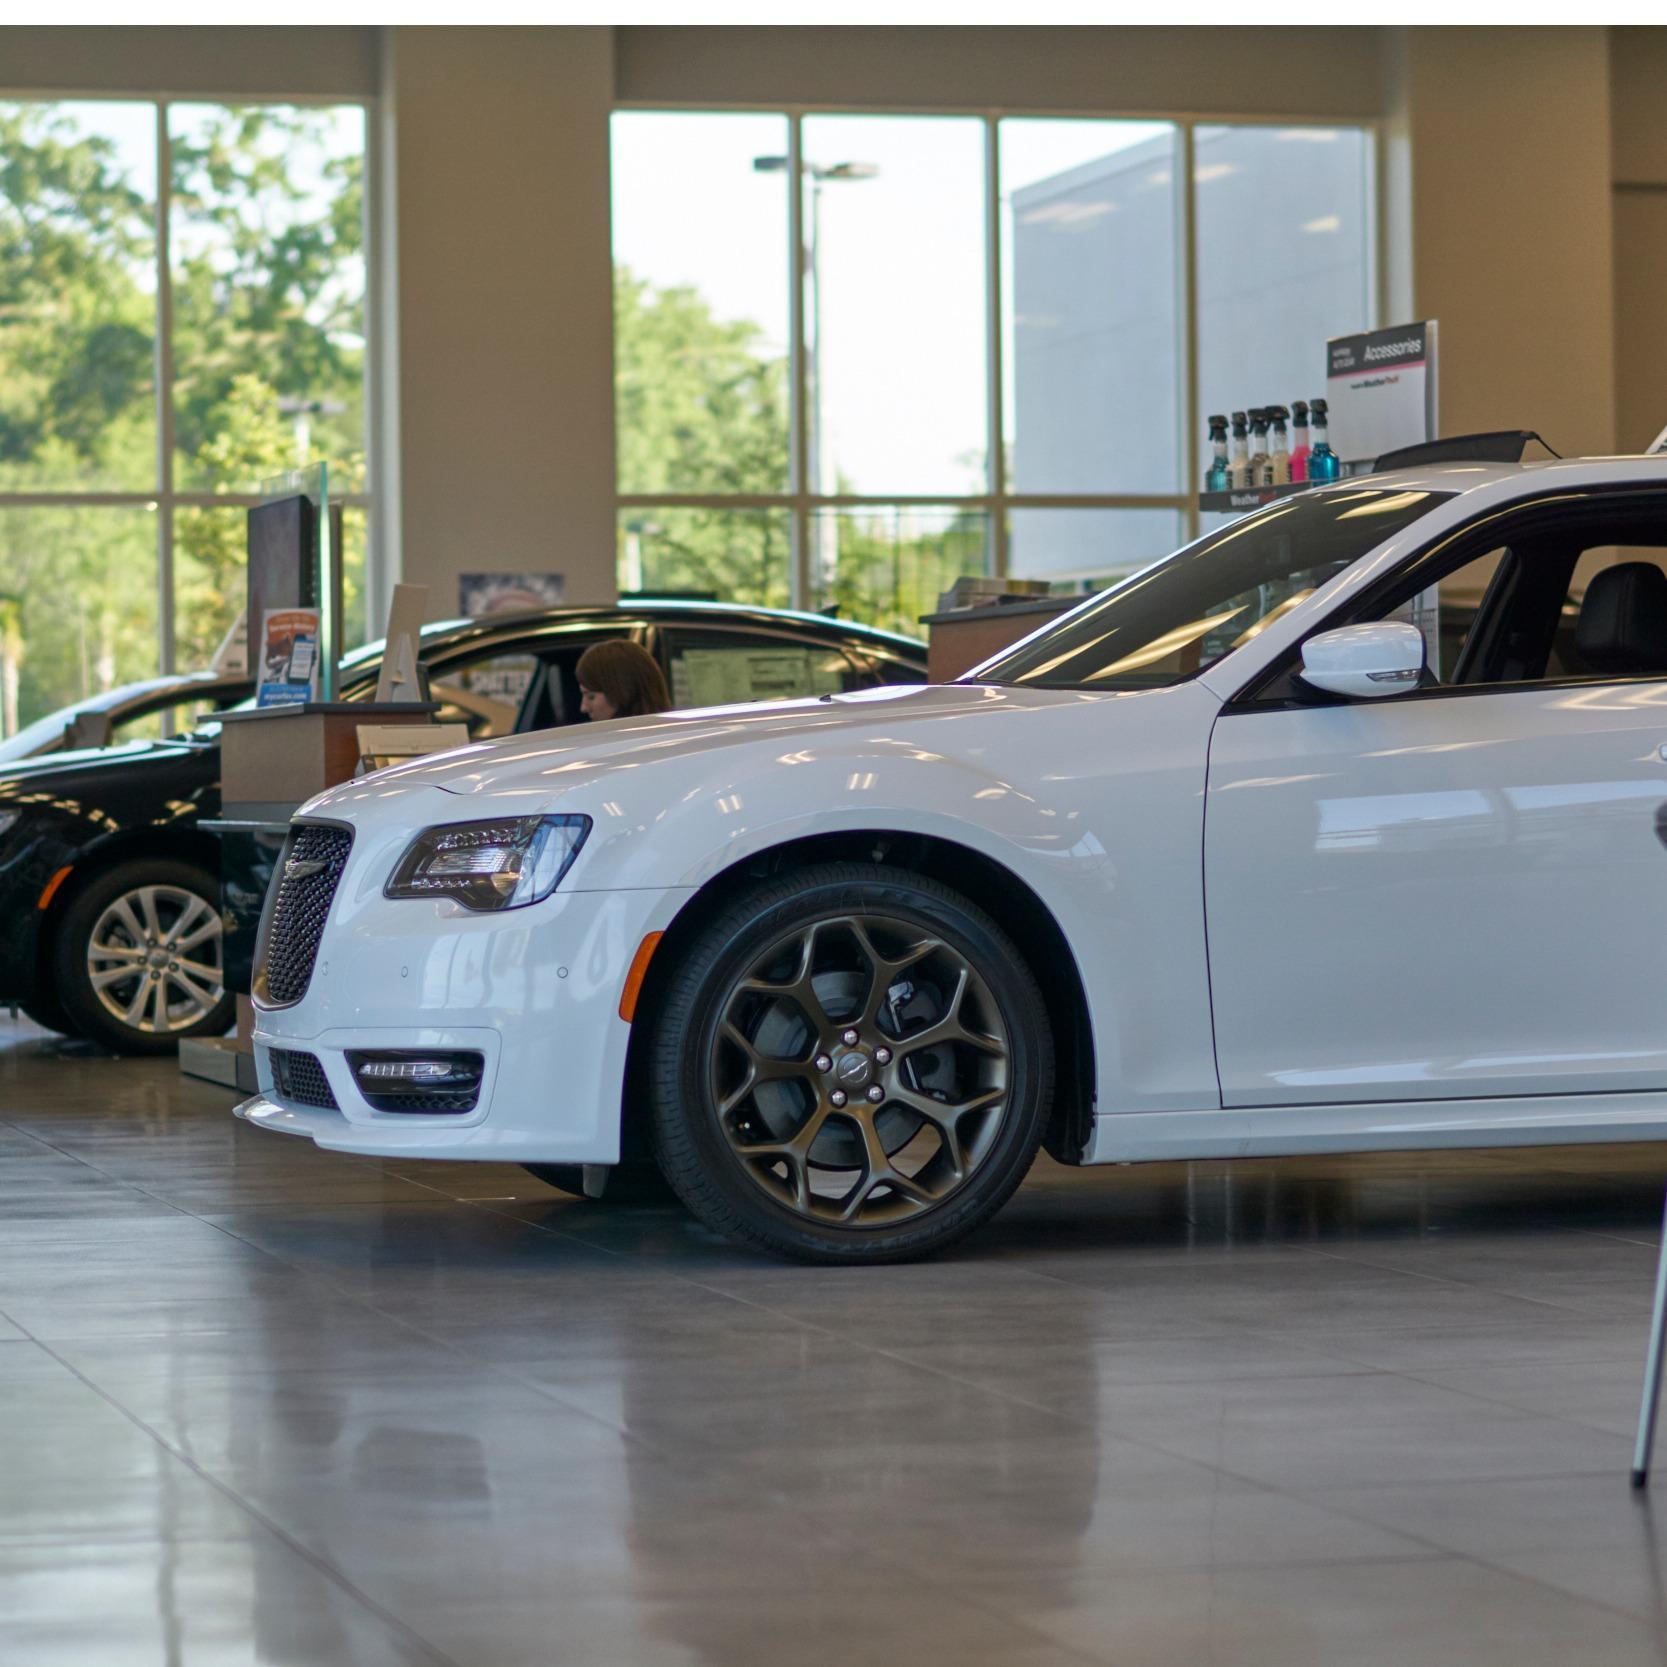 AutoNation Chrysler Dodge Jeep RAM North Savannah